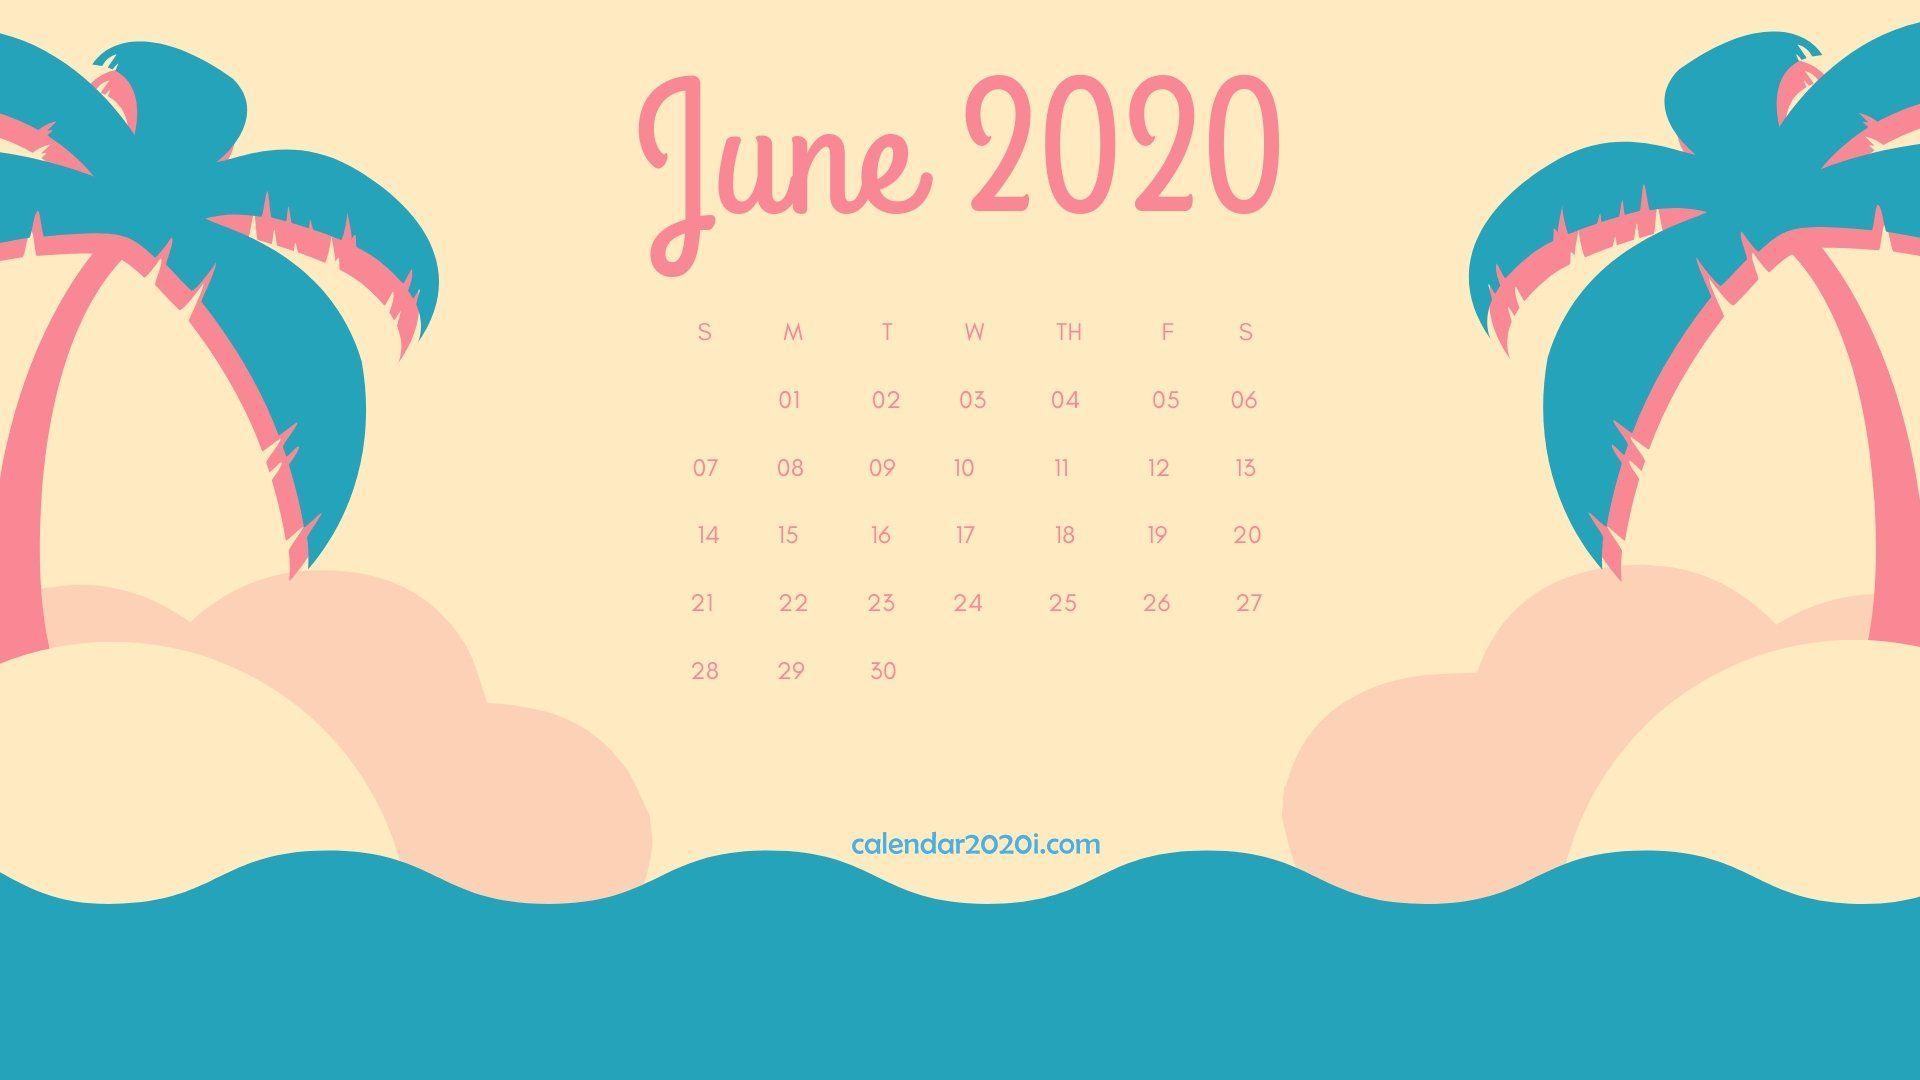 June 2020 Calendar Desktop Wallpaper in 2019 Calendar wallpaper 1920x1080